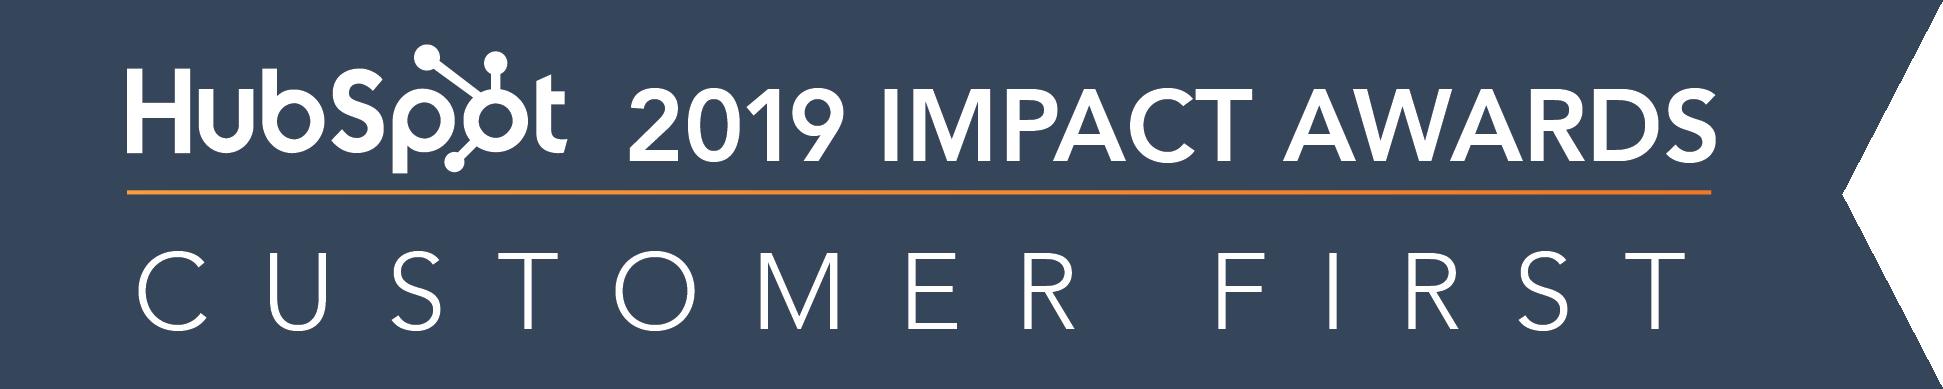 Hubspot_ImpactAwards_2019_CustomerFirst-02